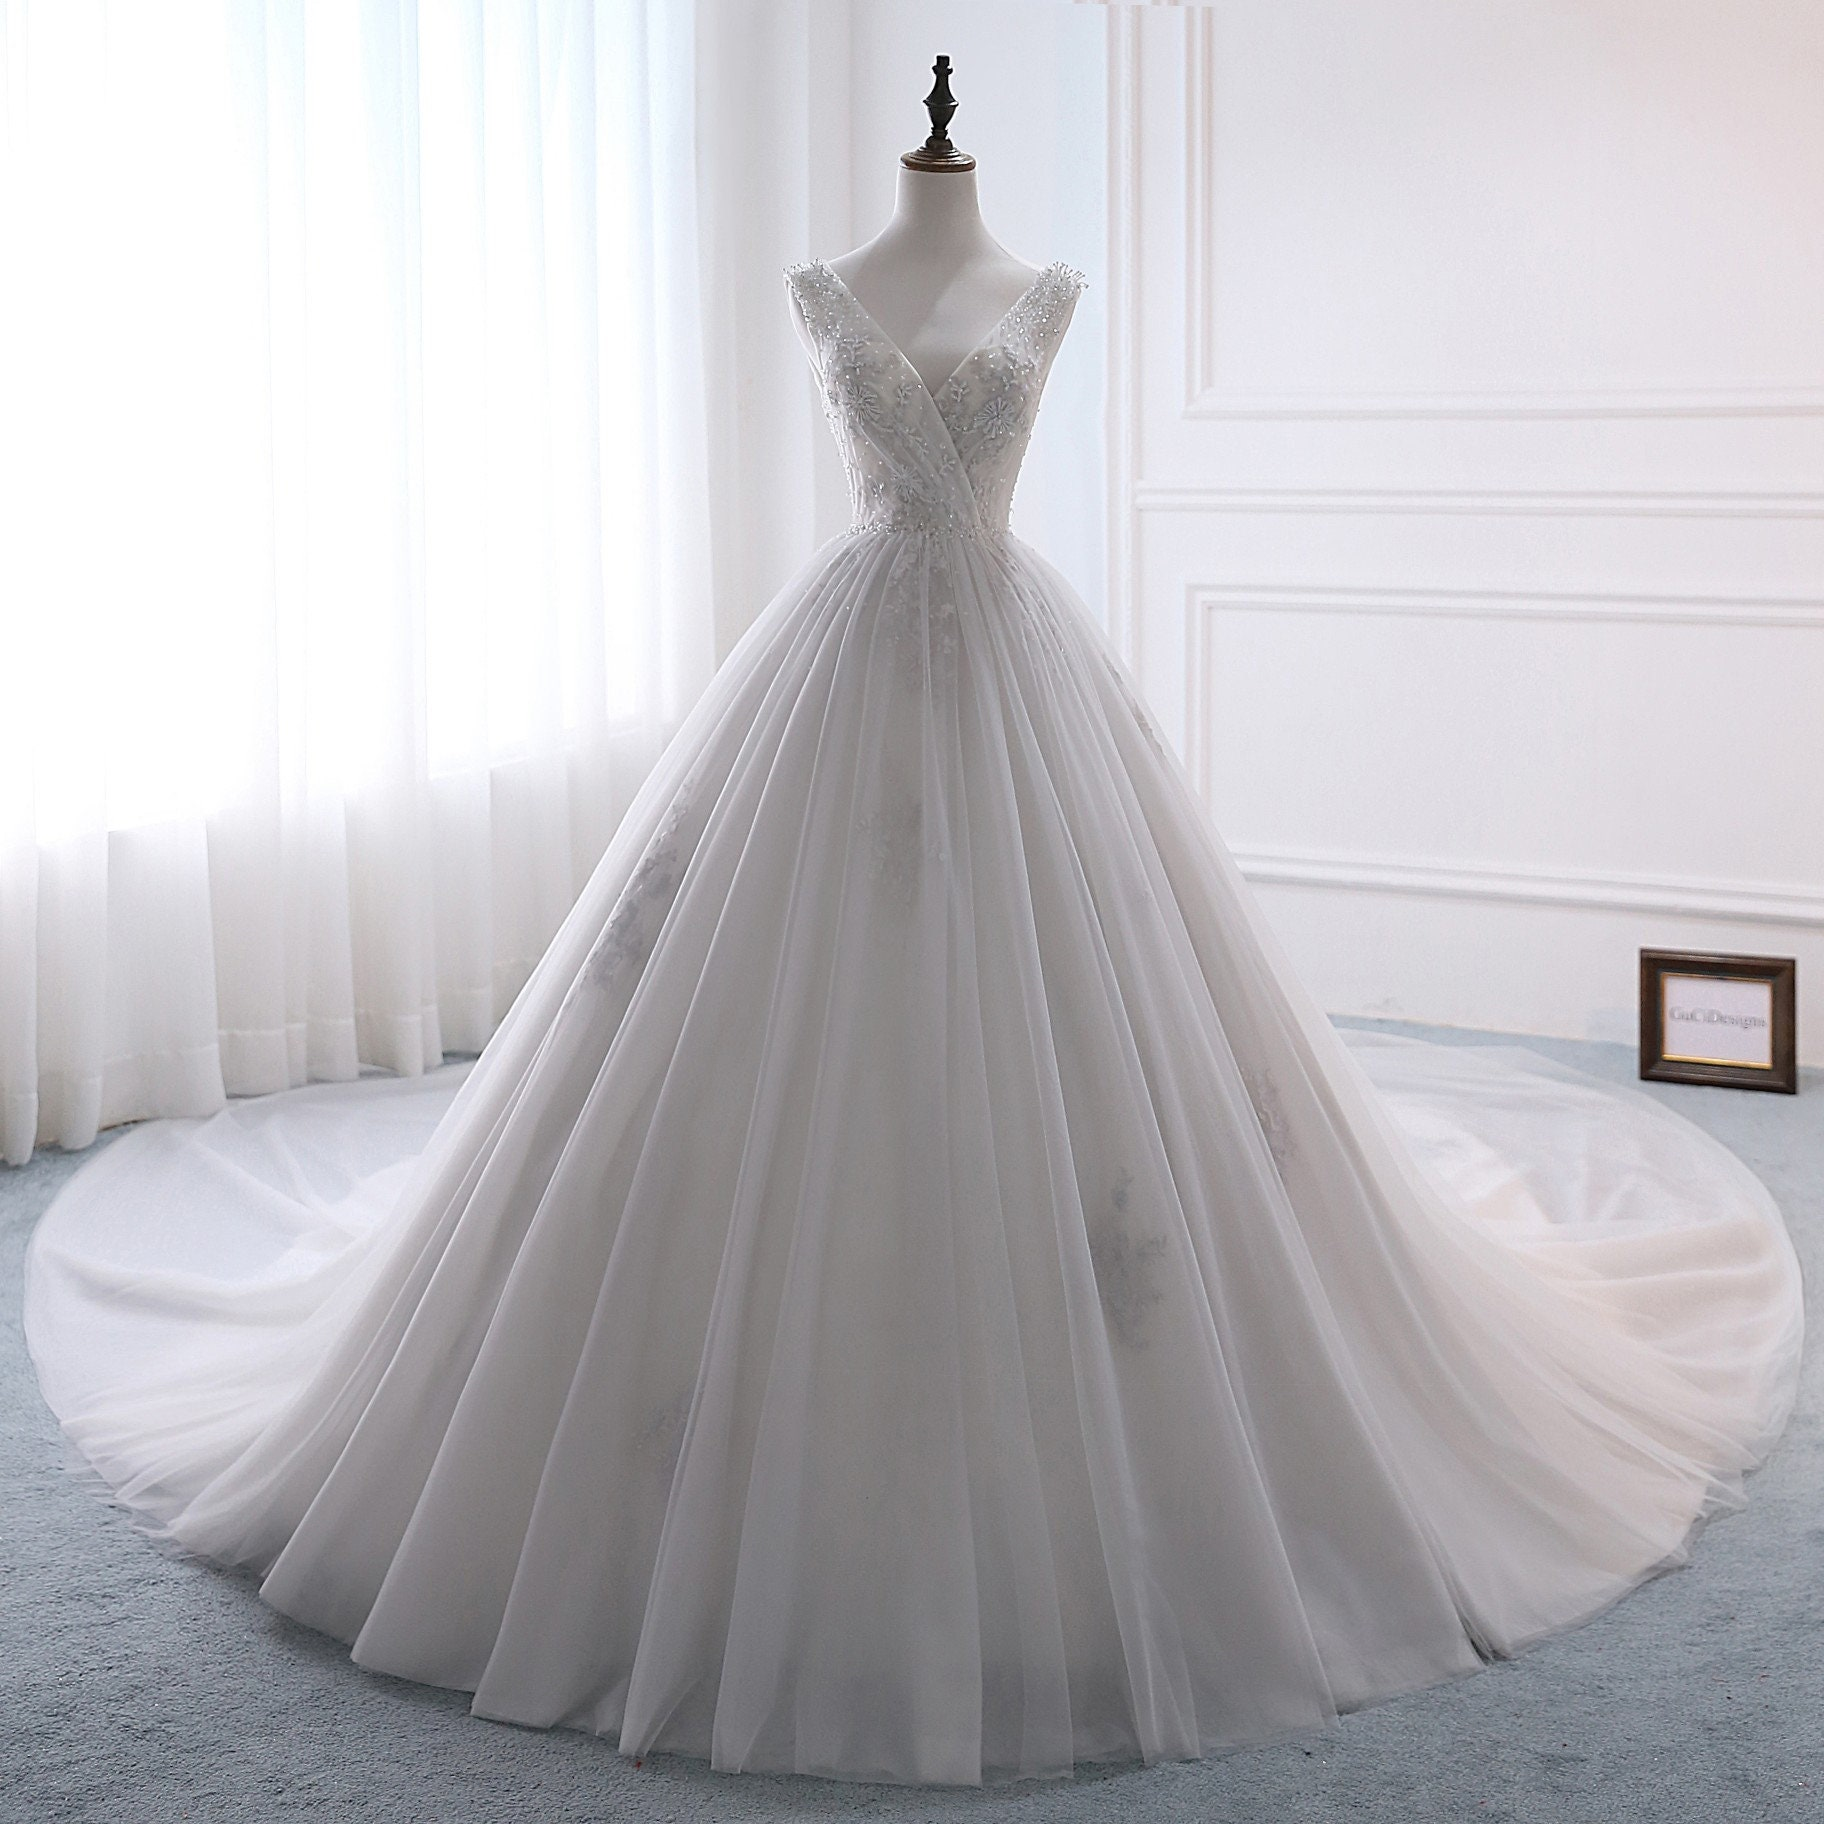 b5abc2f85bf GuCiDesigns A-line Luxury Wedding Dresses Sexy V-neck White